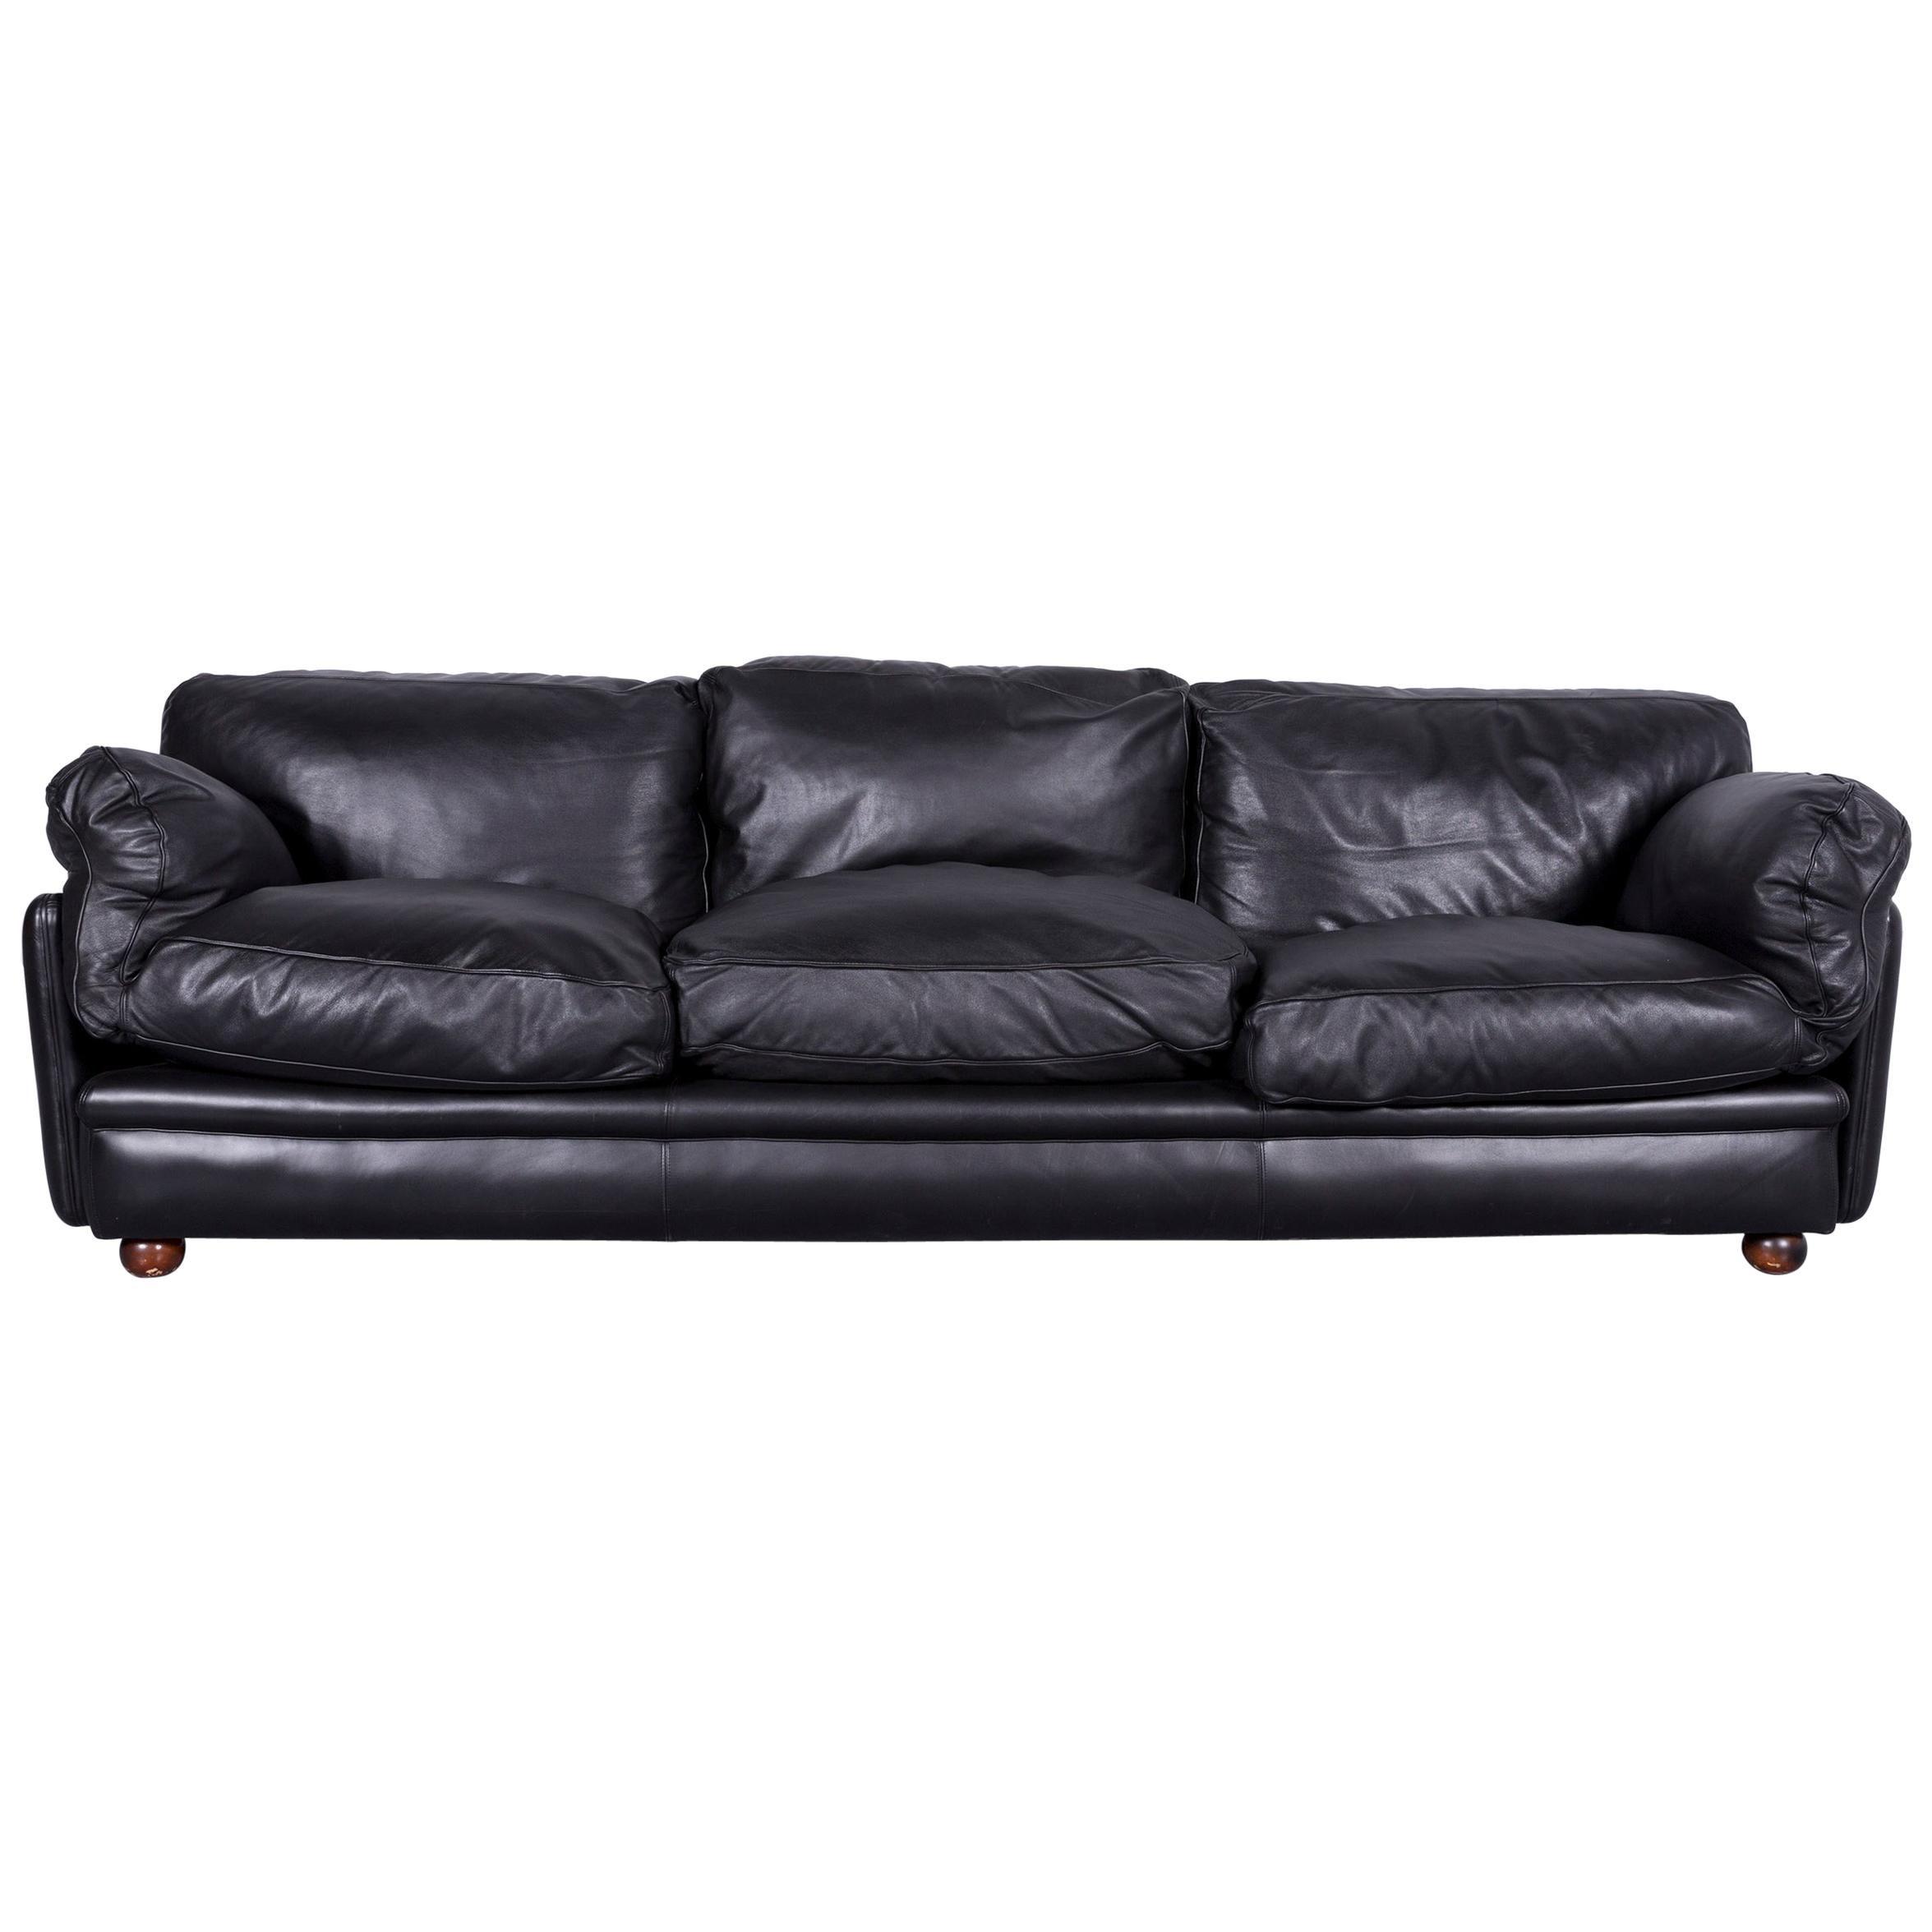 Poltrona Frau Designer Leather Sofa In Black Three Seat Couch